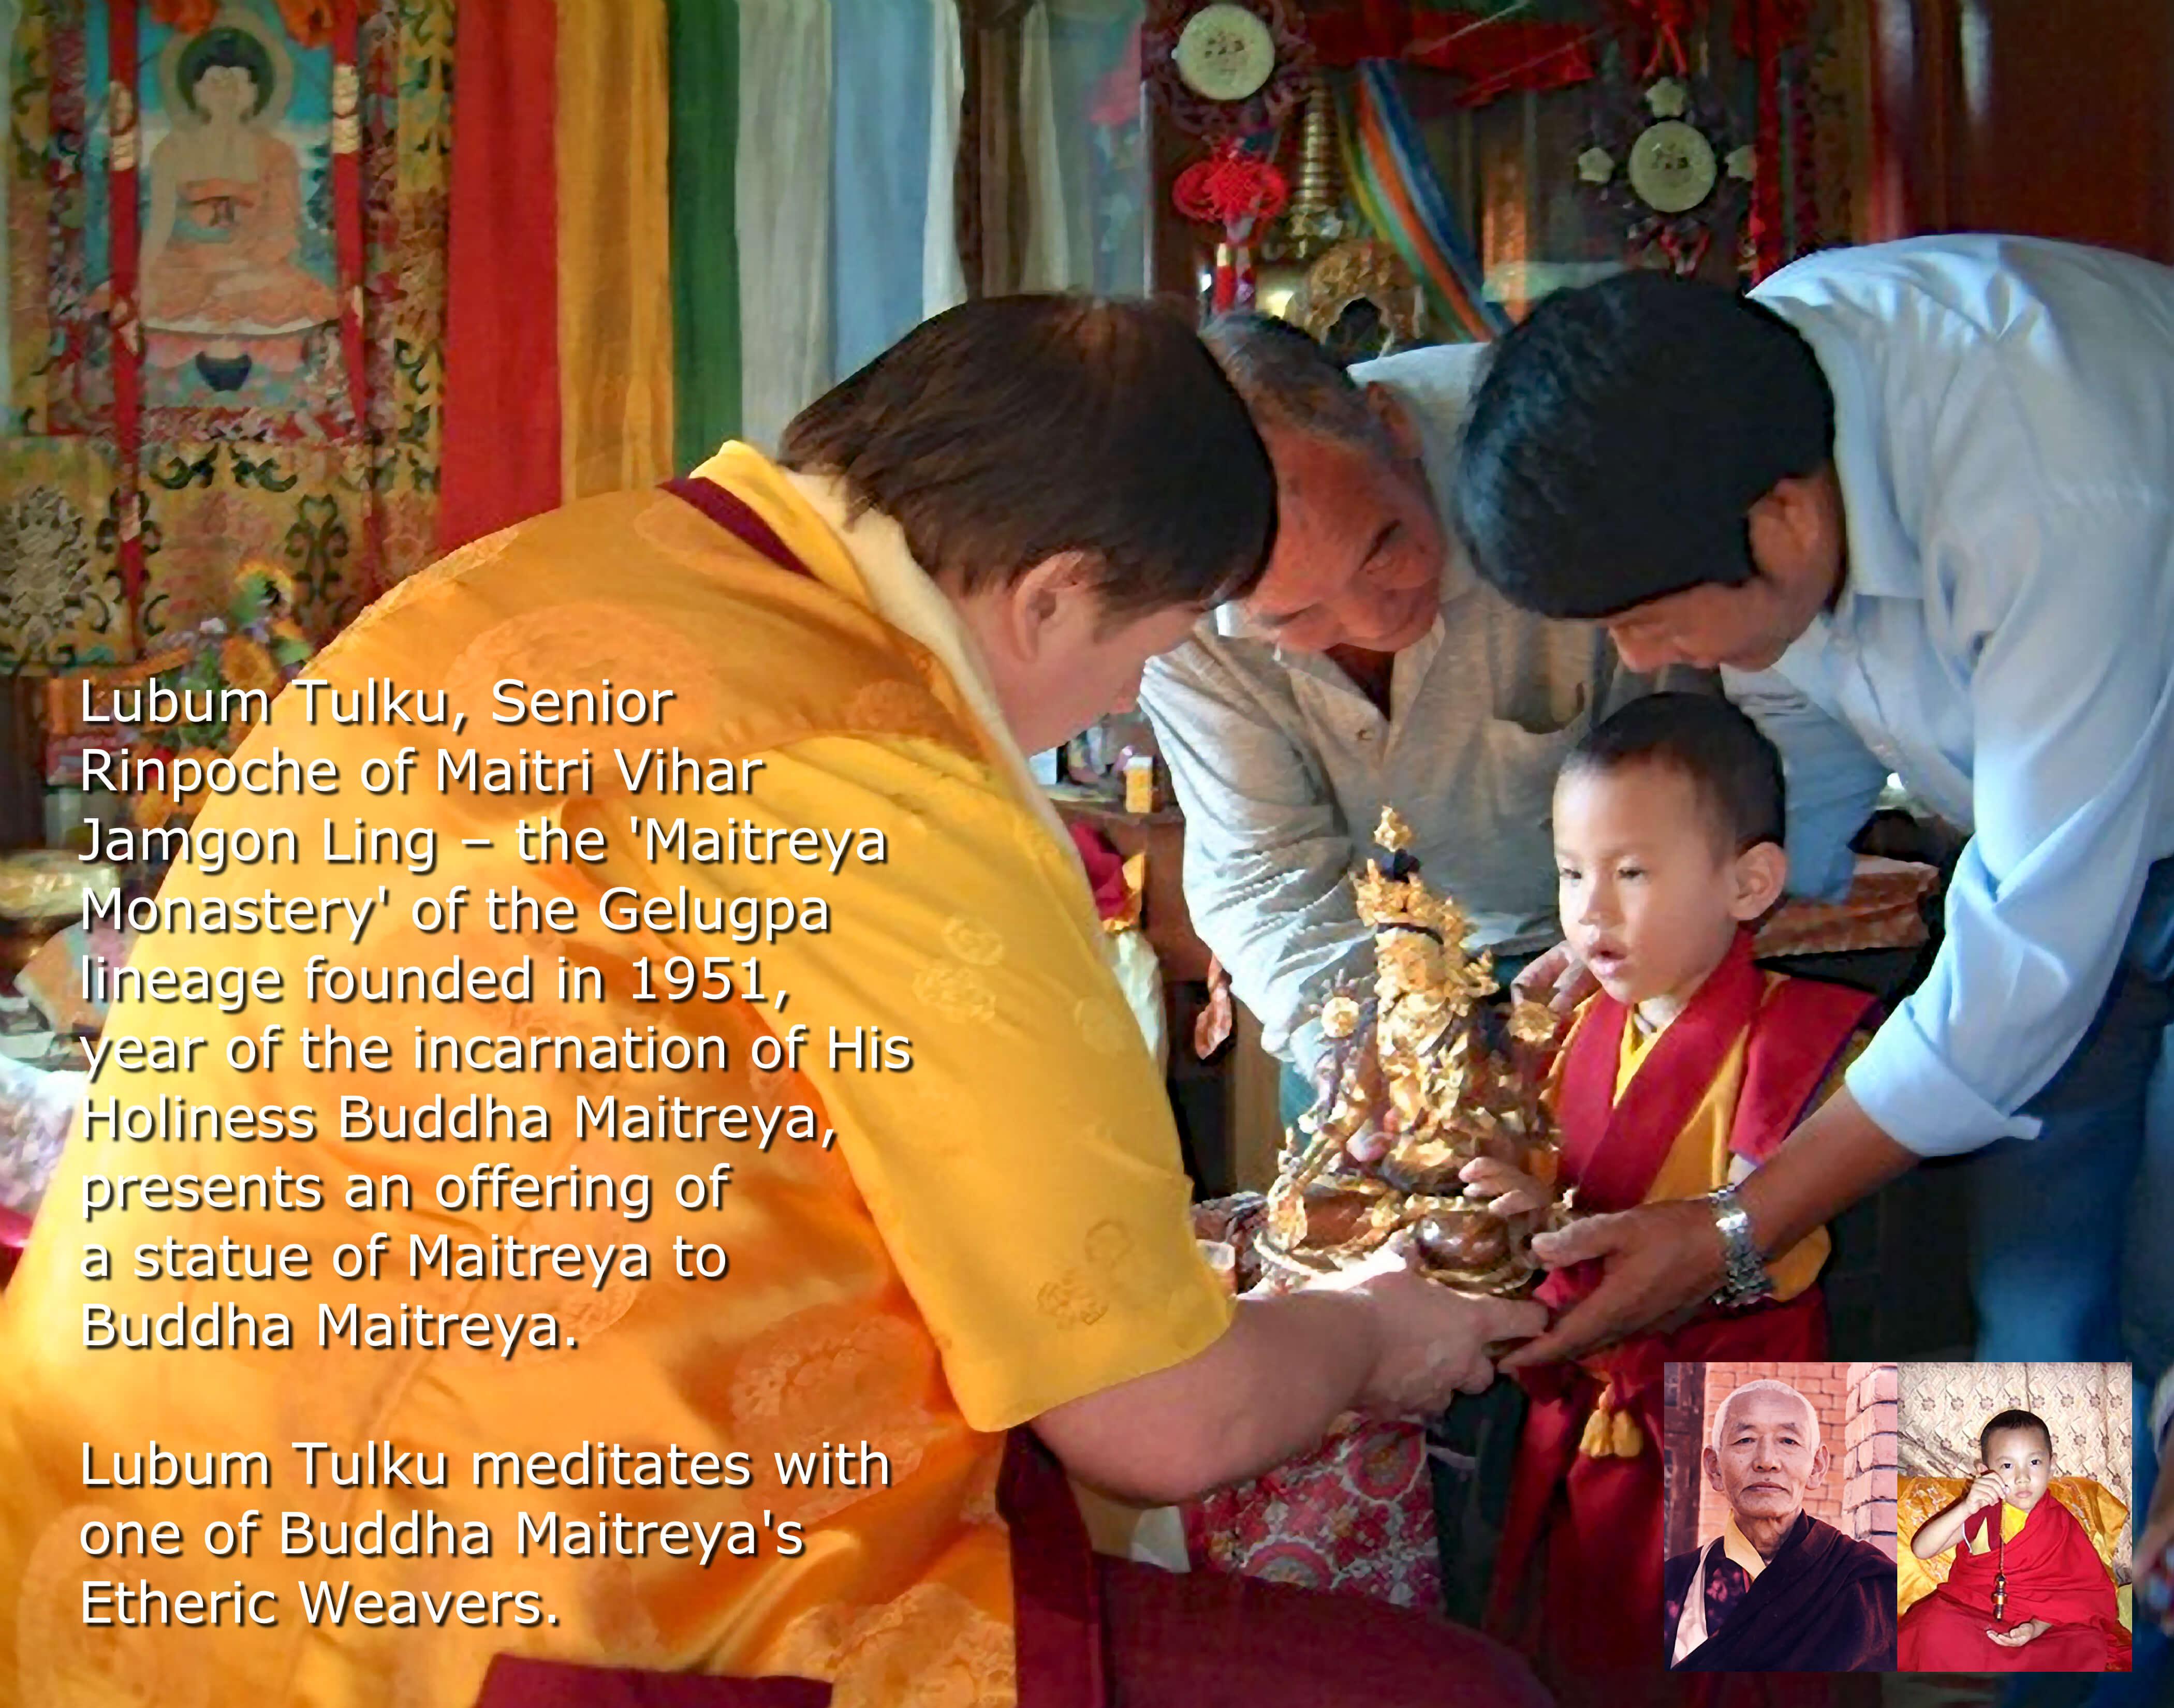 Buddha Maitreya with Lubum Tulku